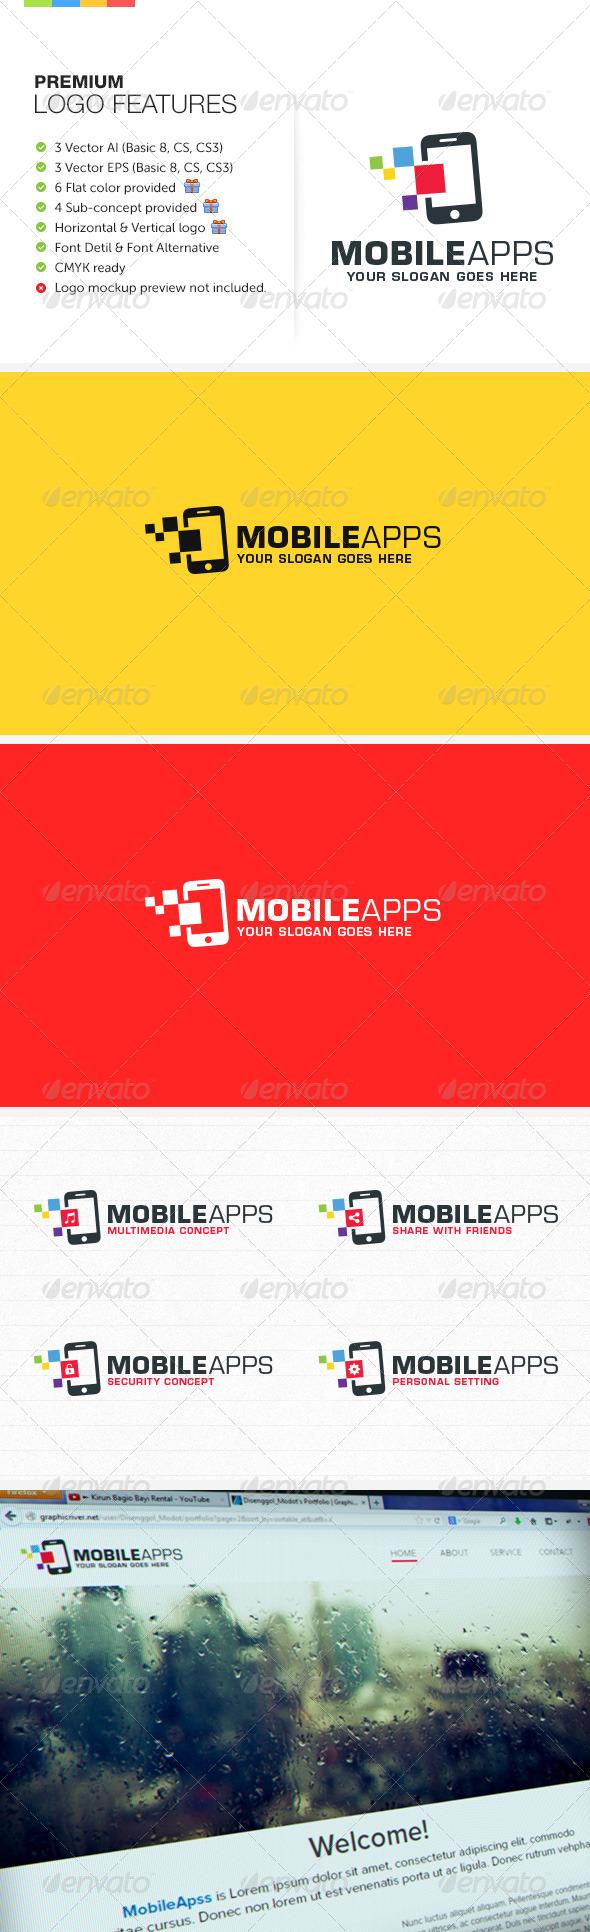 GraphicRiver Mobile Apps Logo 6460704